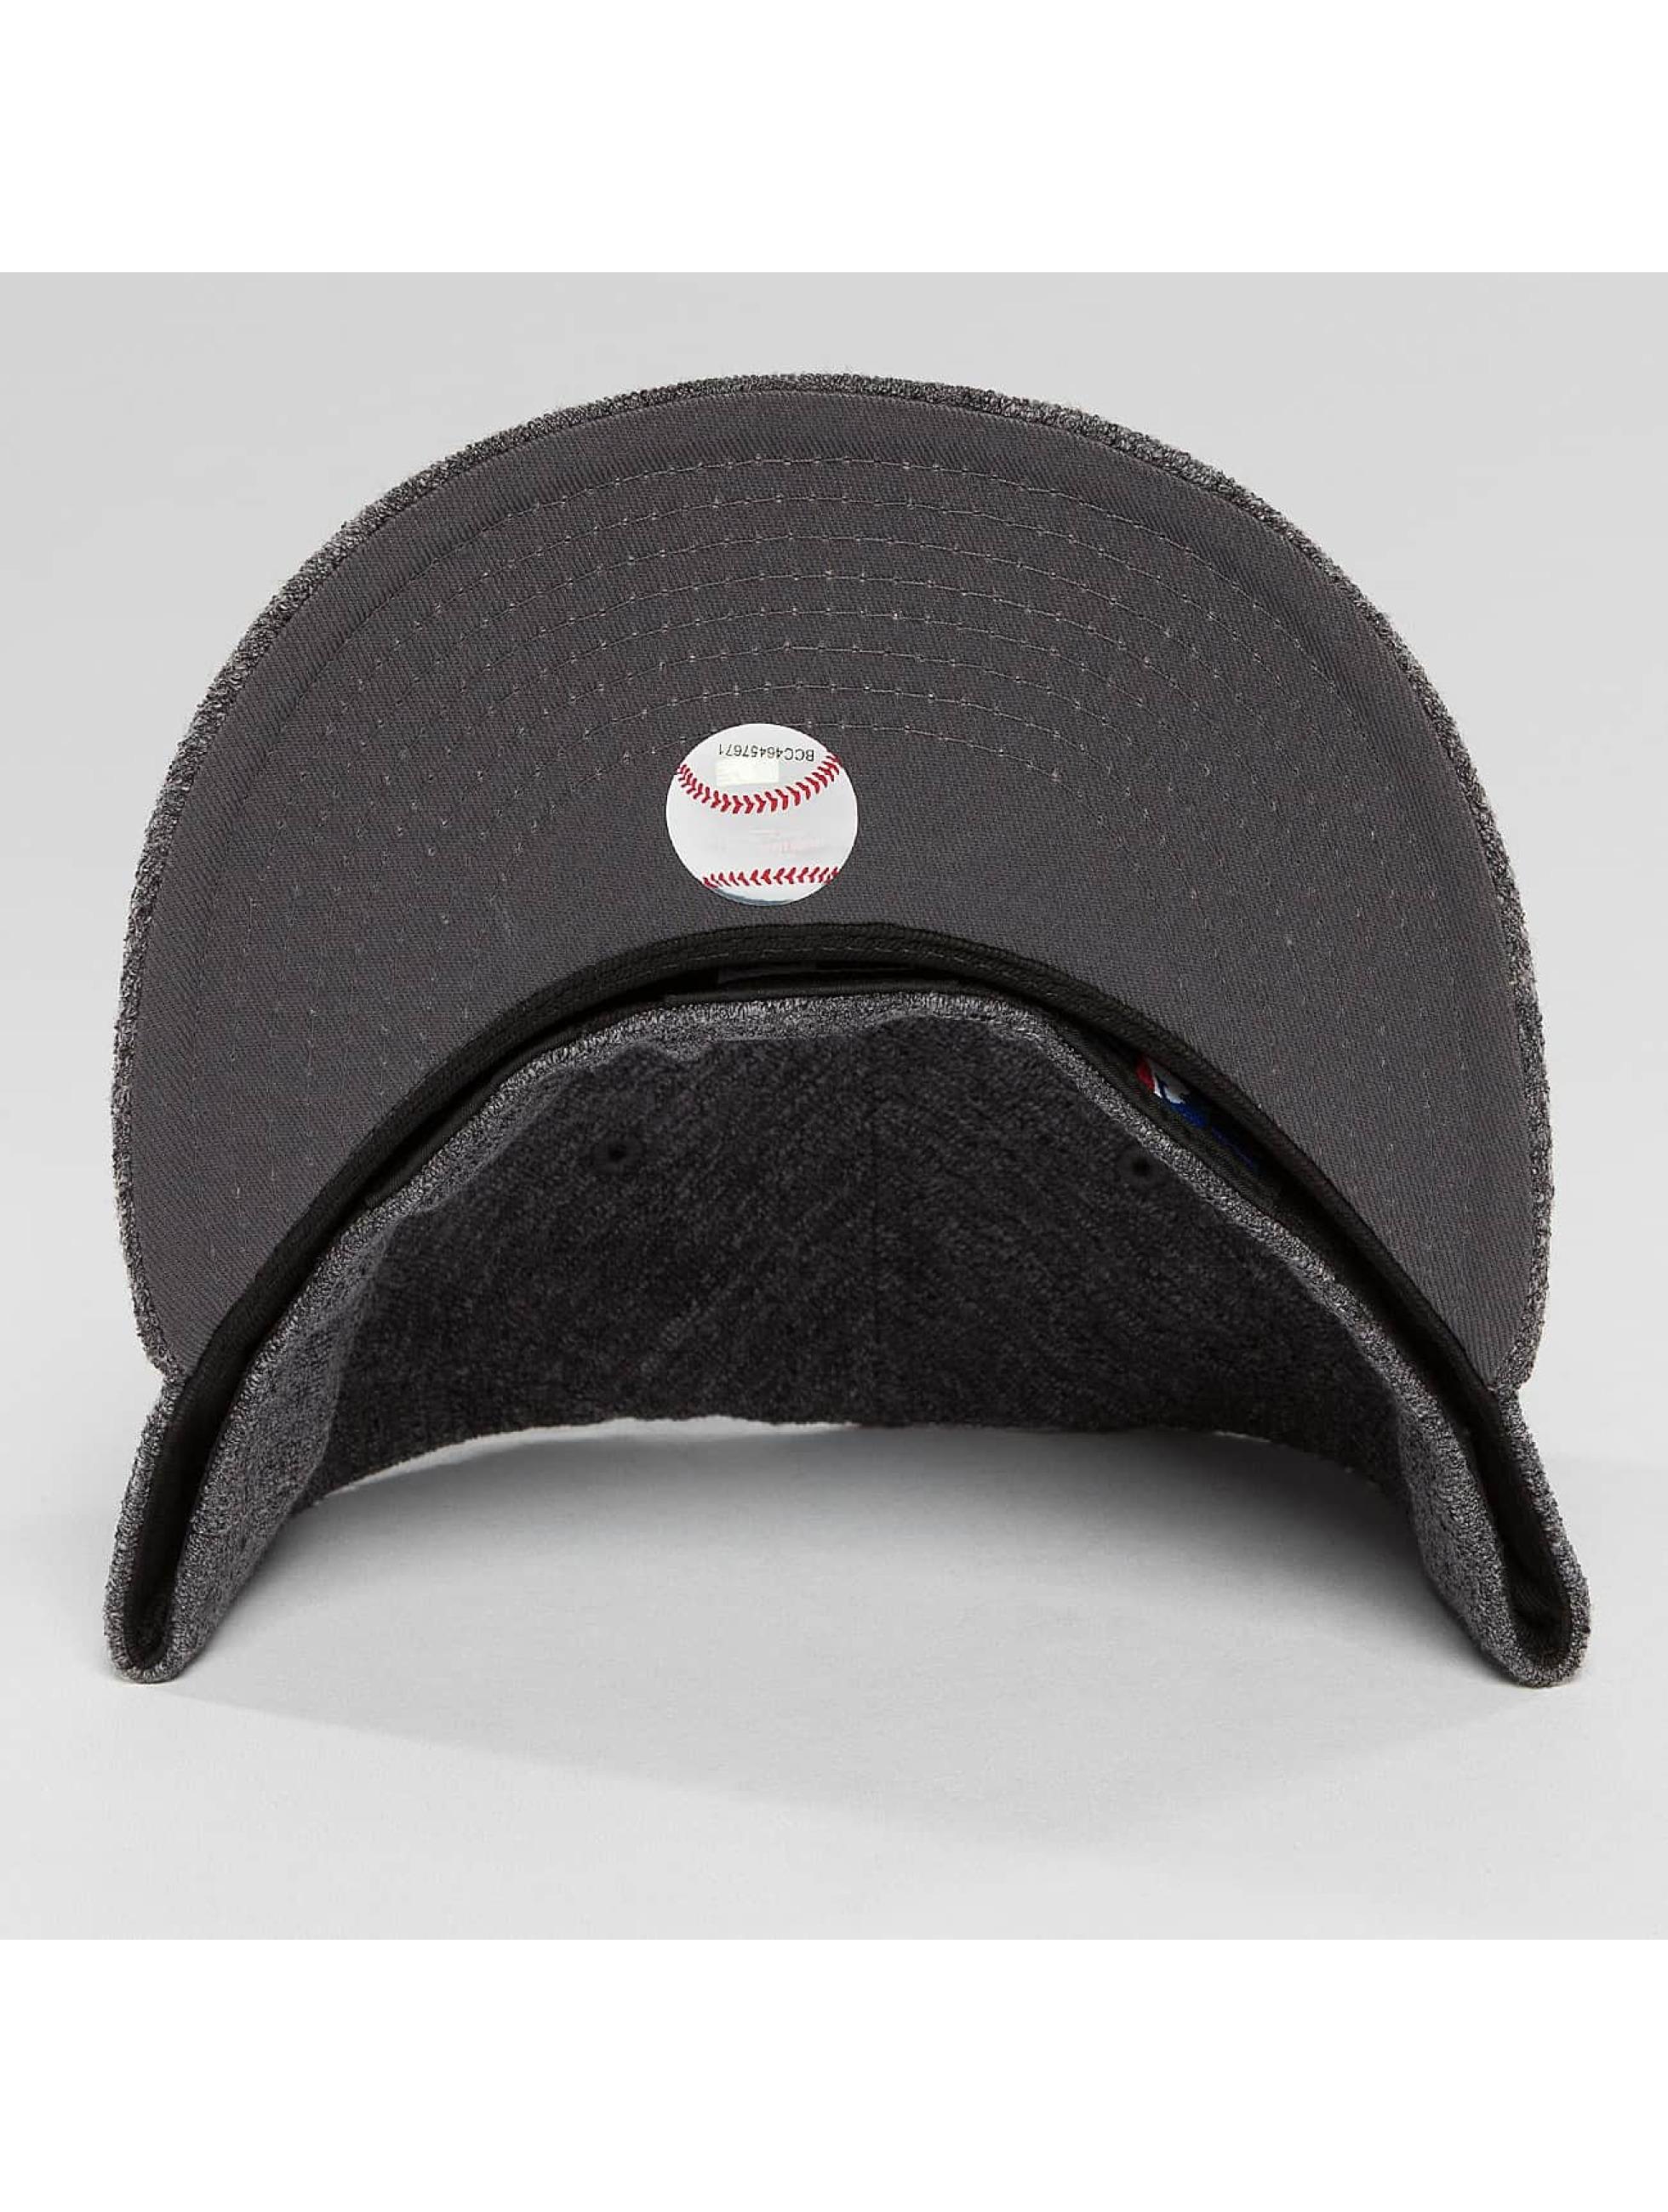 New Era Fitted Cap Slub LA Dodgers 59Fifty gray